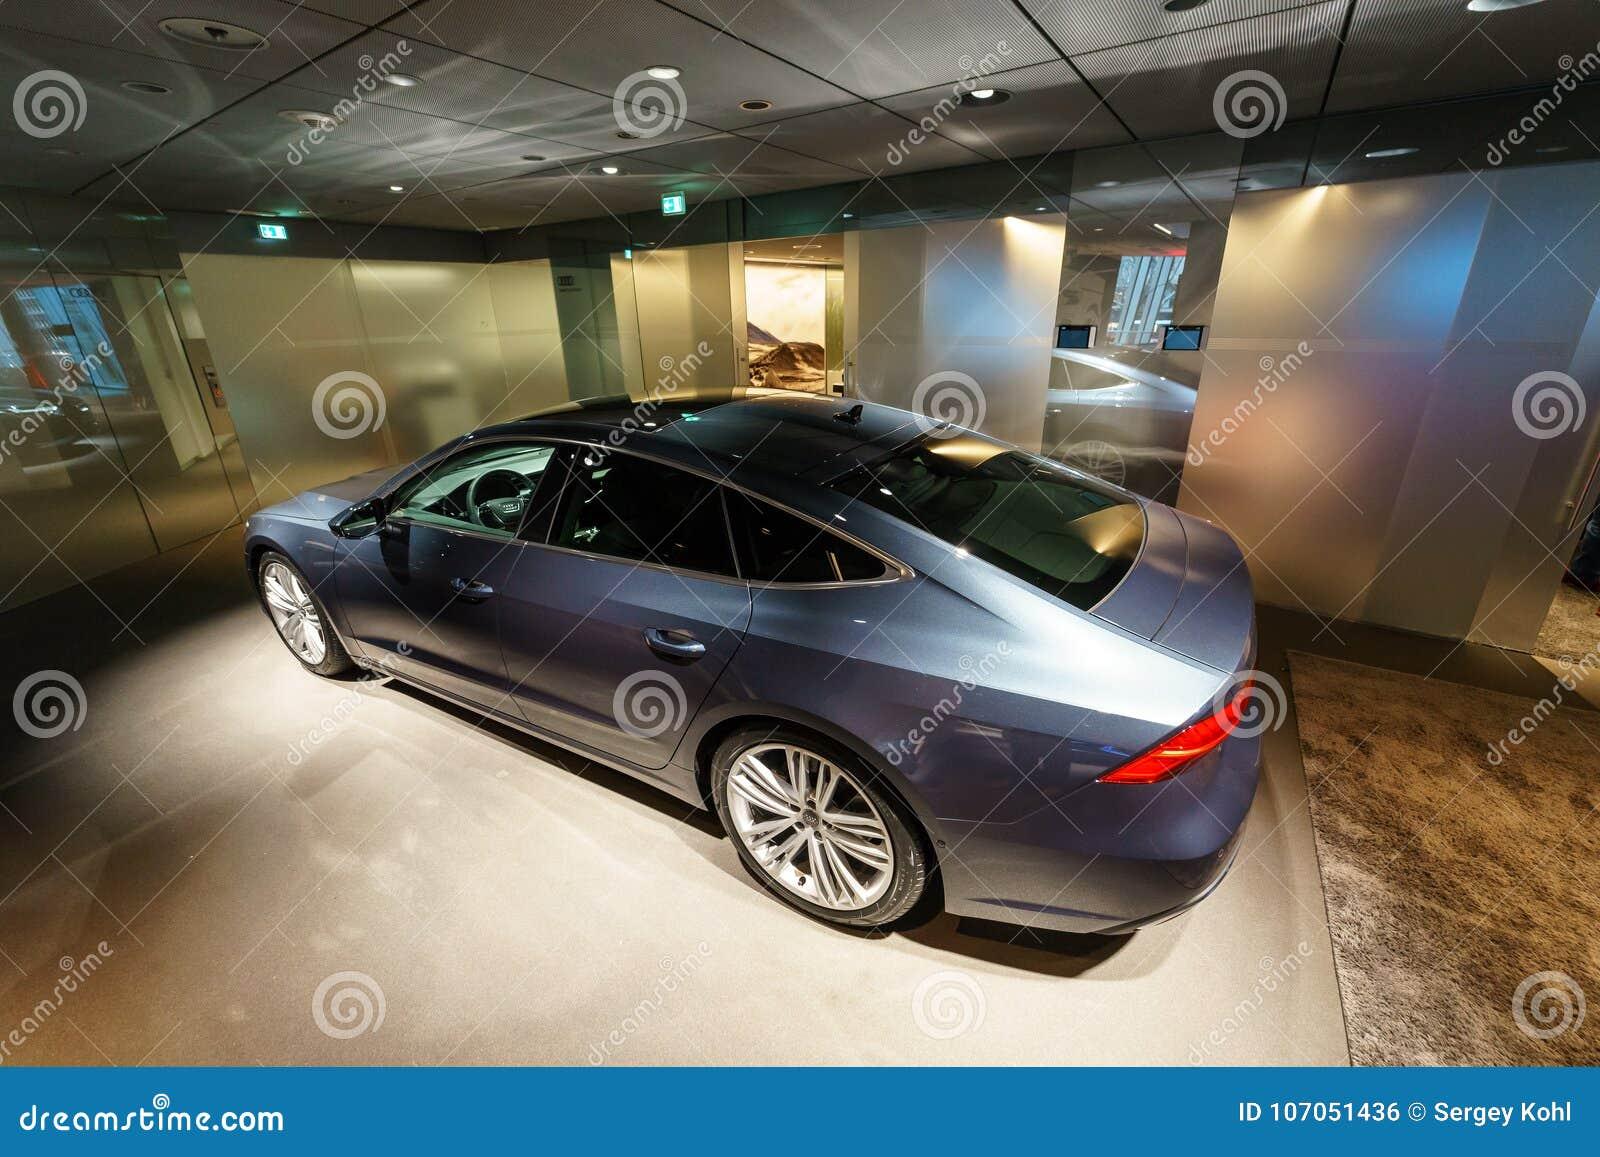 Mid Size Luxury Car Audi A7 Sportback 55 Tfsi Quattro Editorial Automobile S7 Download Photo